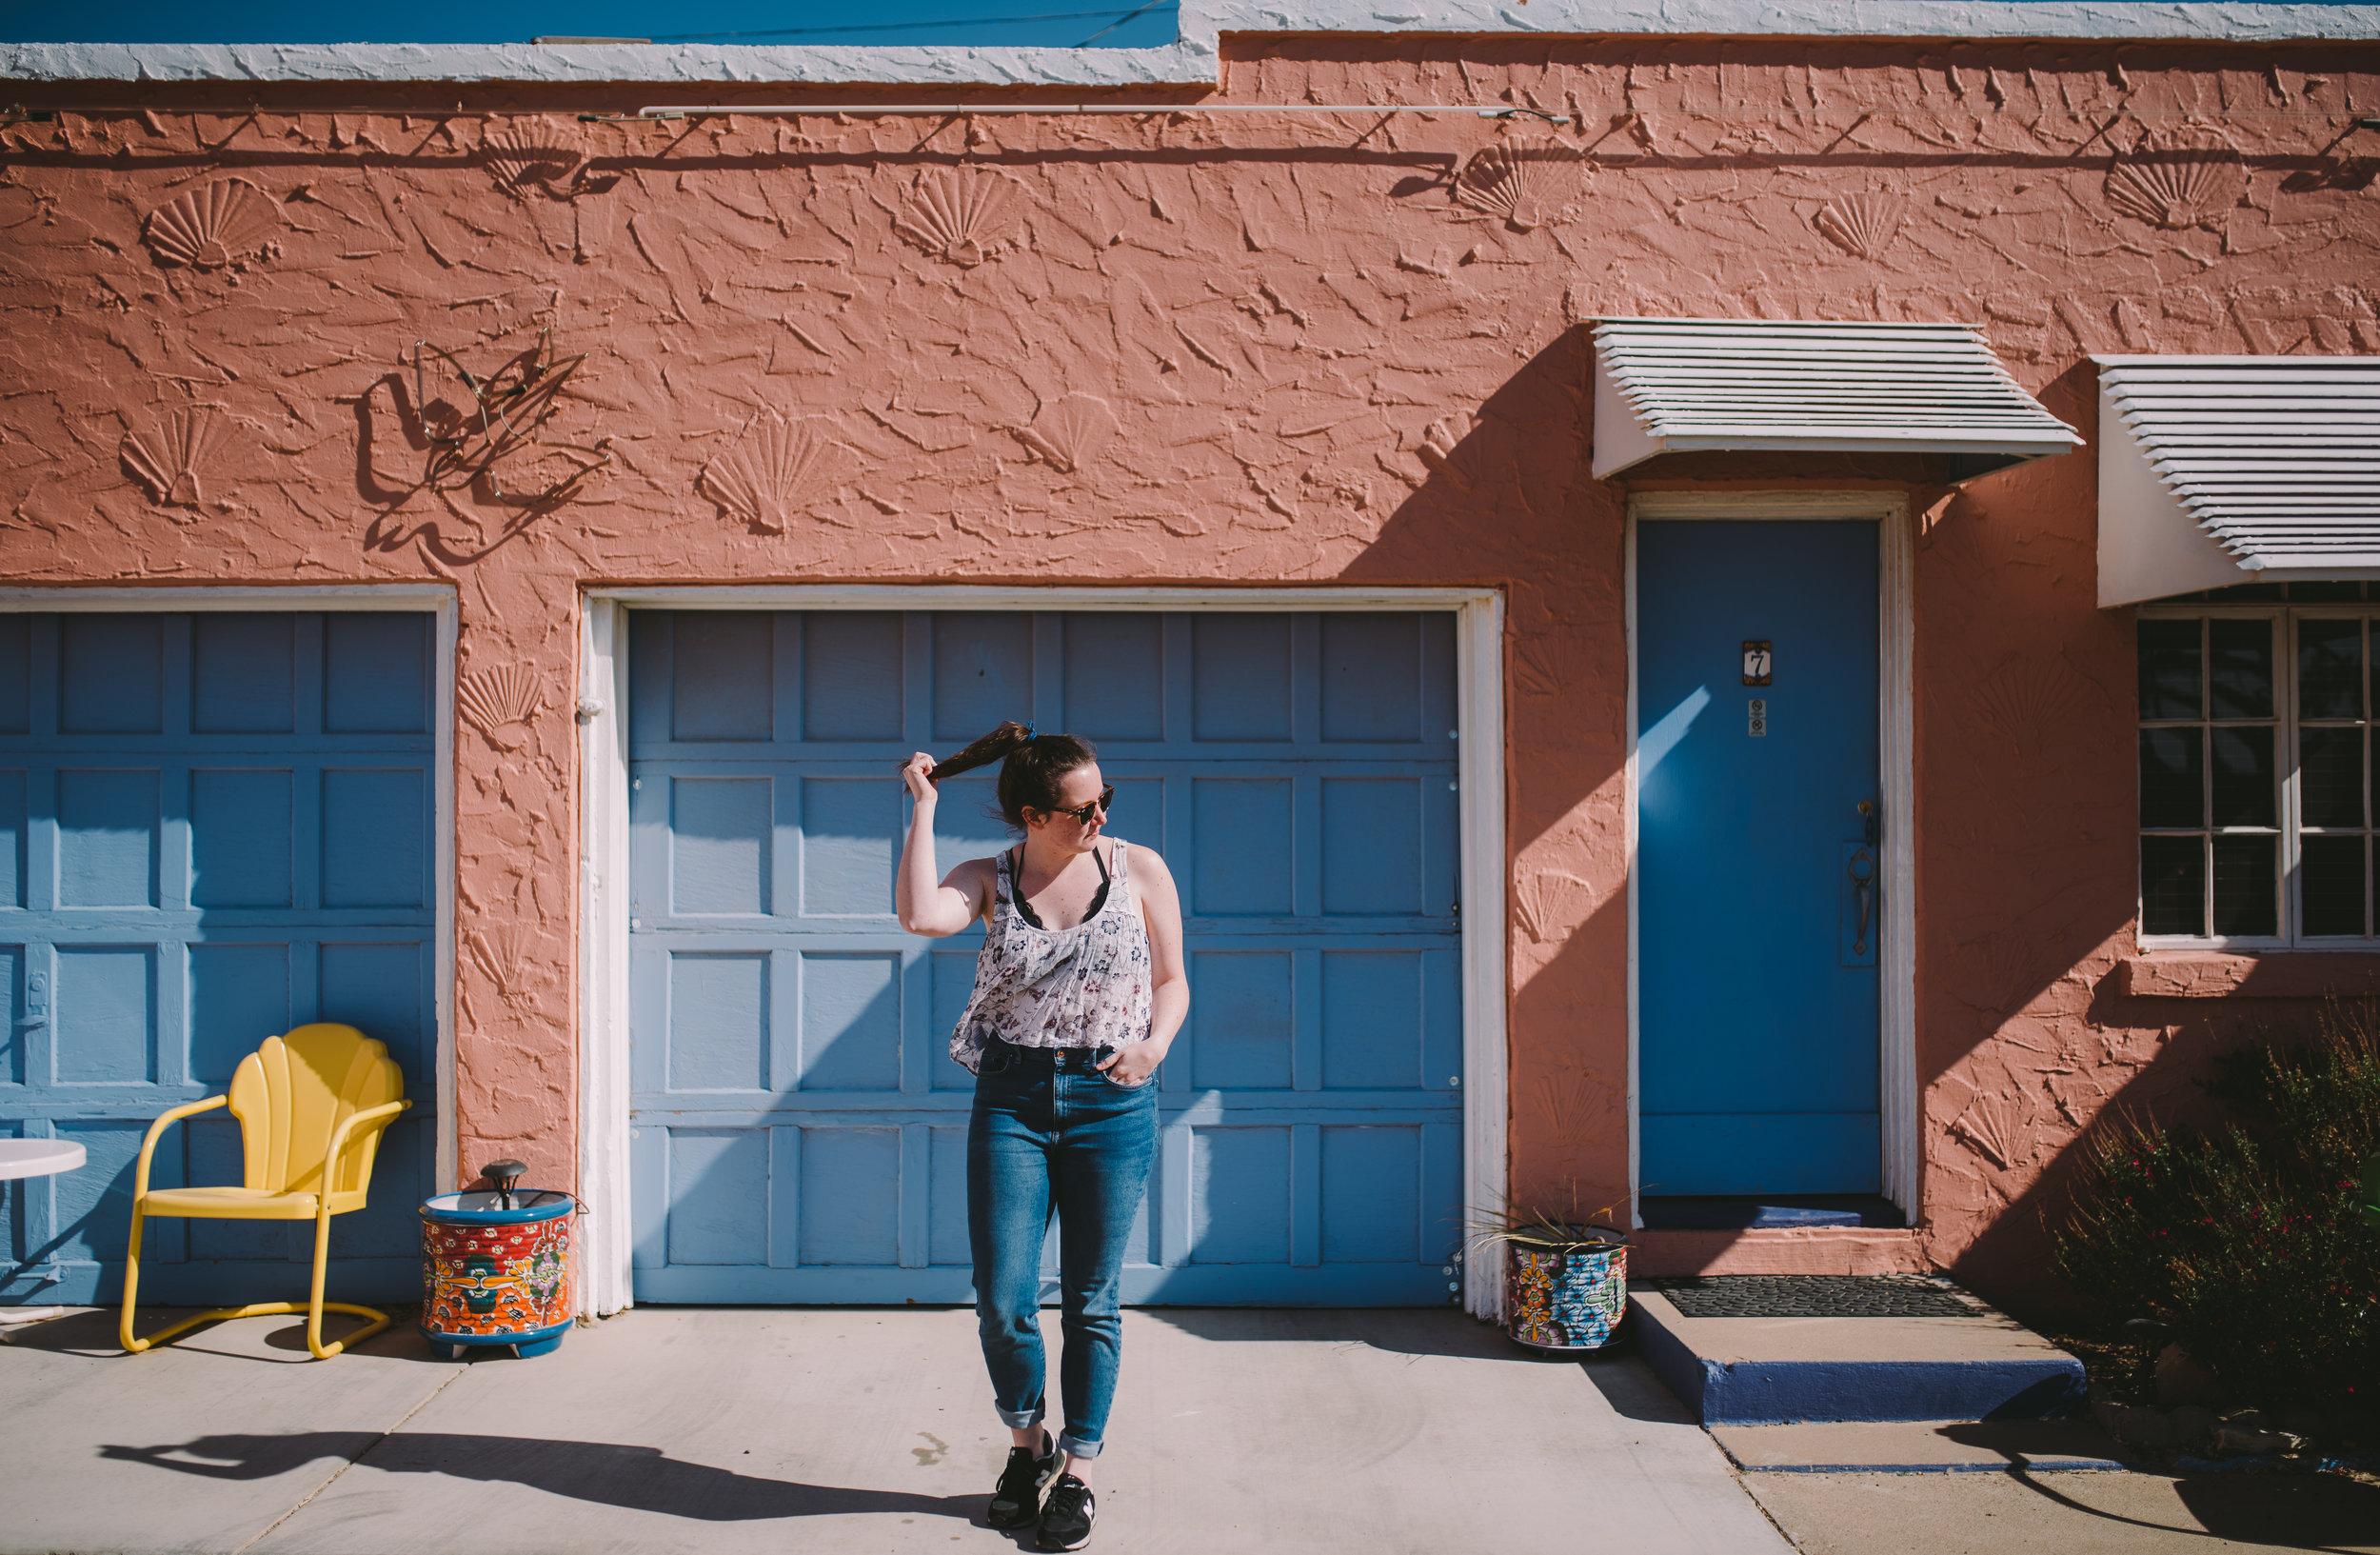 Samantha_NewMexico_RoadTrip_April2018_Senior Photography In Phoenix Arizona_ArizonaSeniorPhotographer_SamanthaRosePhotography_-3-2.jpg